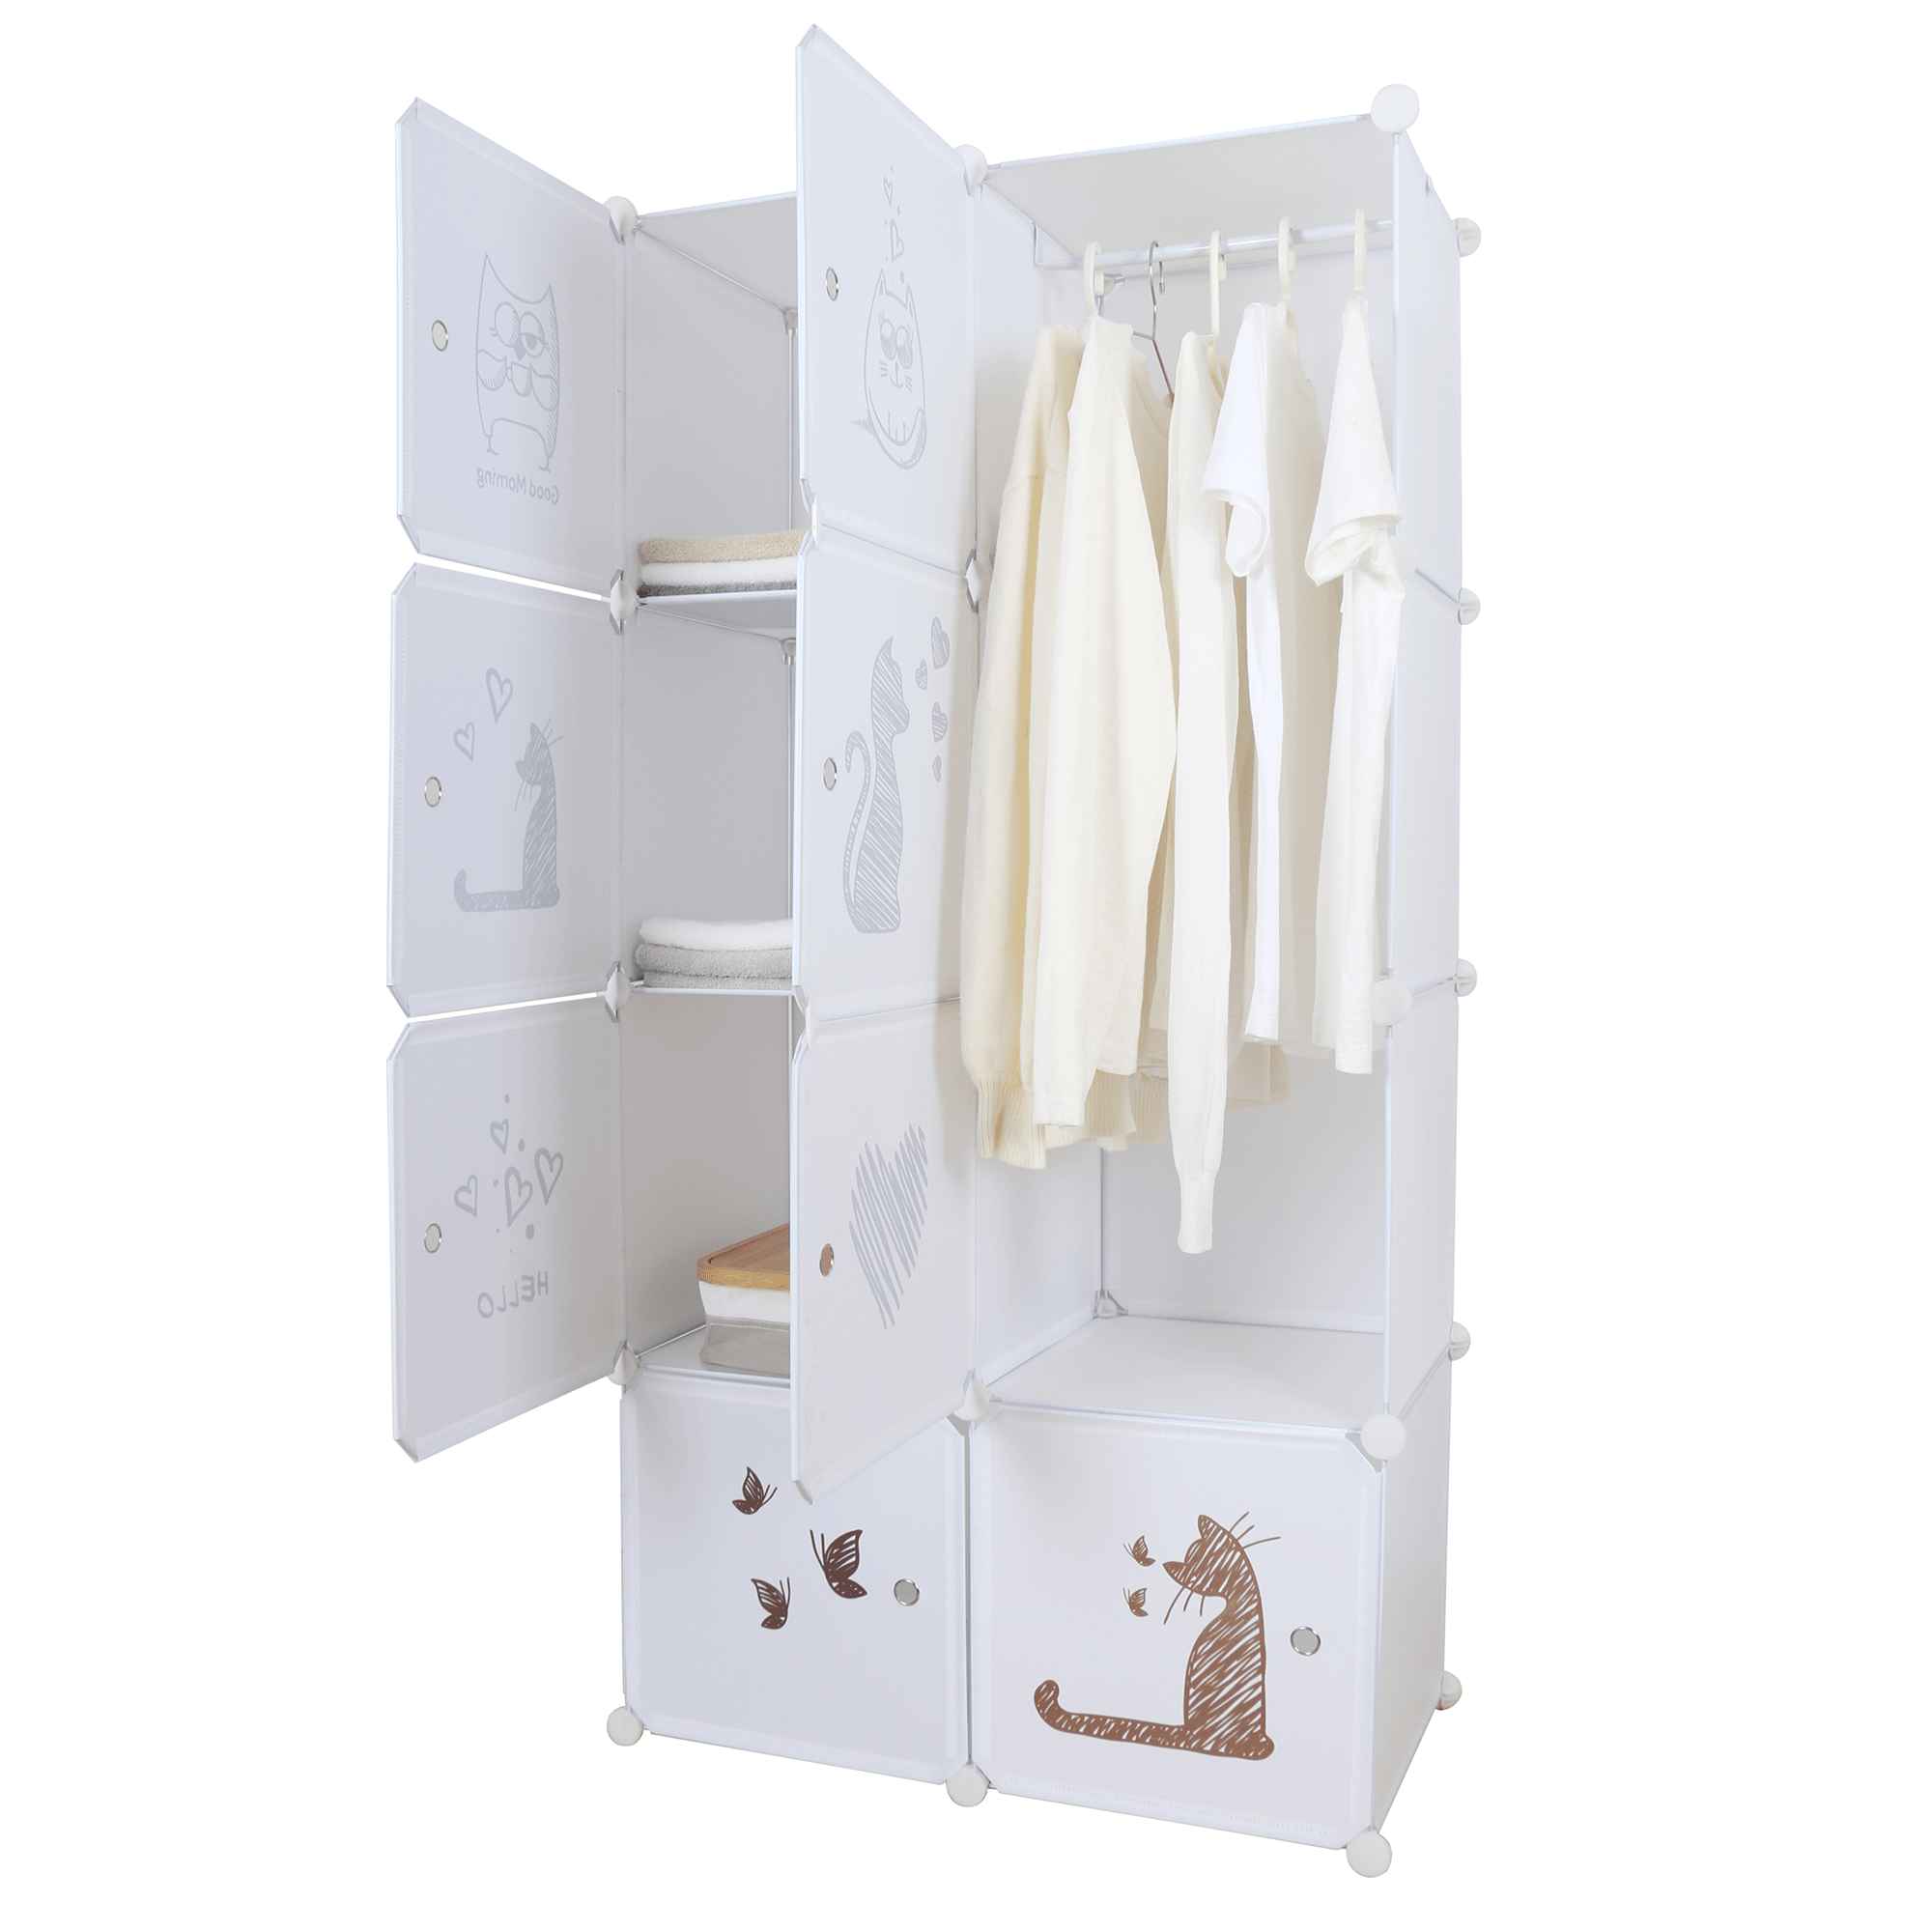 Dětská modulární skříň, bílá / hnědý vzor, KIRBY, TEMPO KONDELA